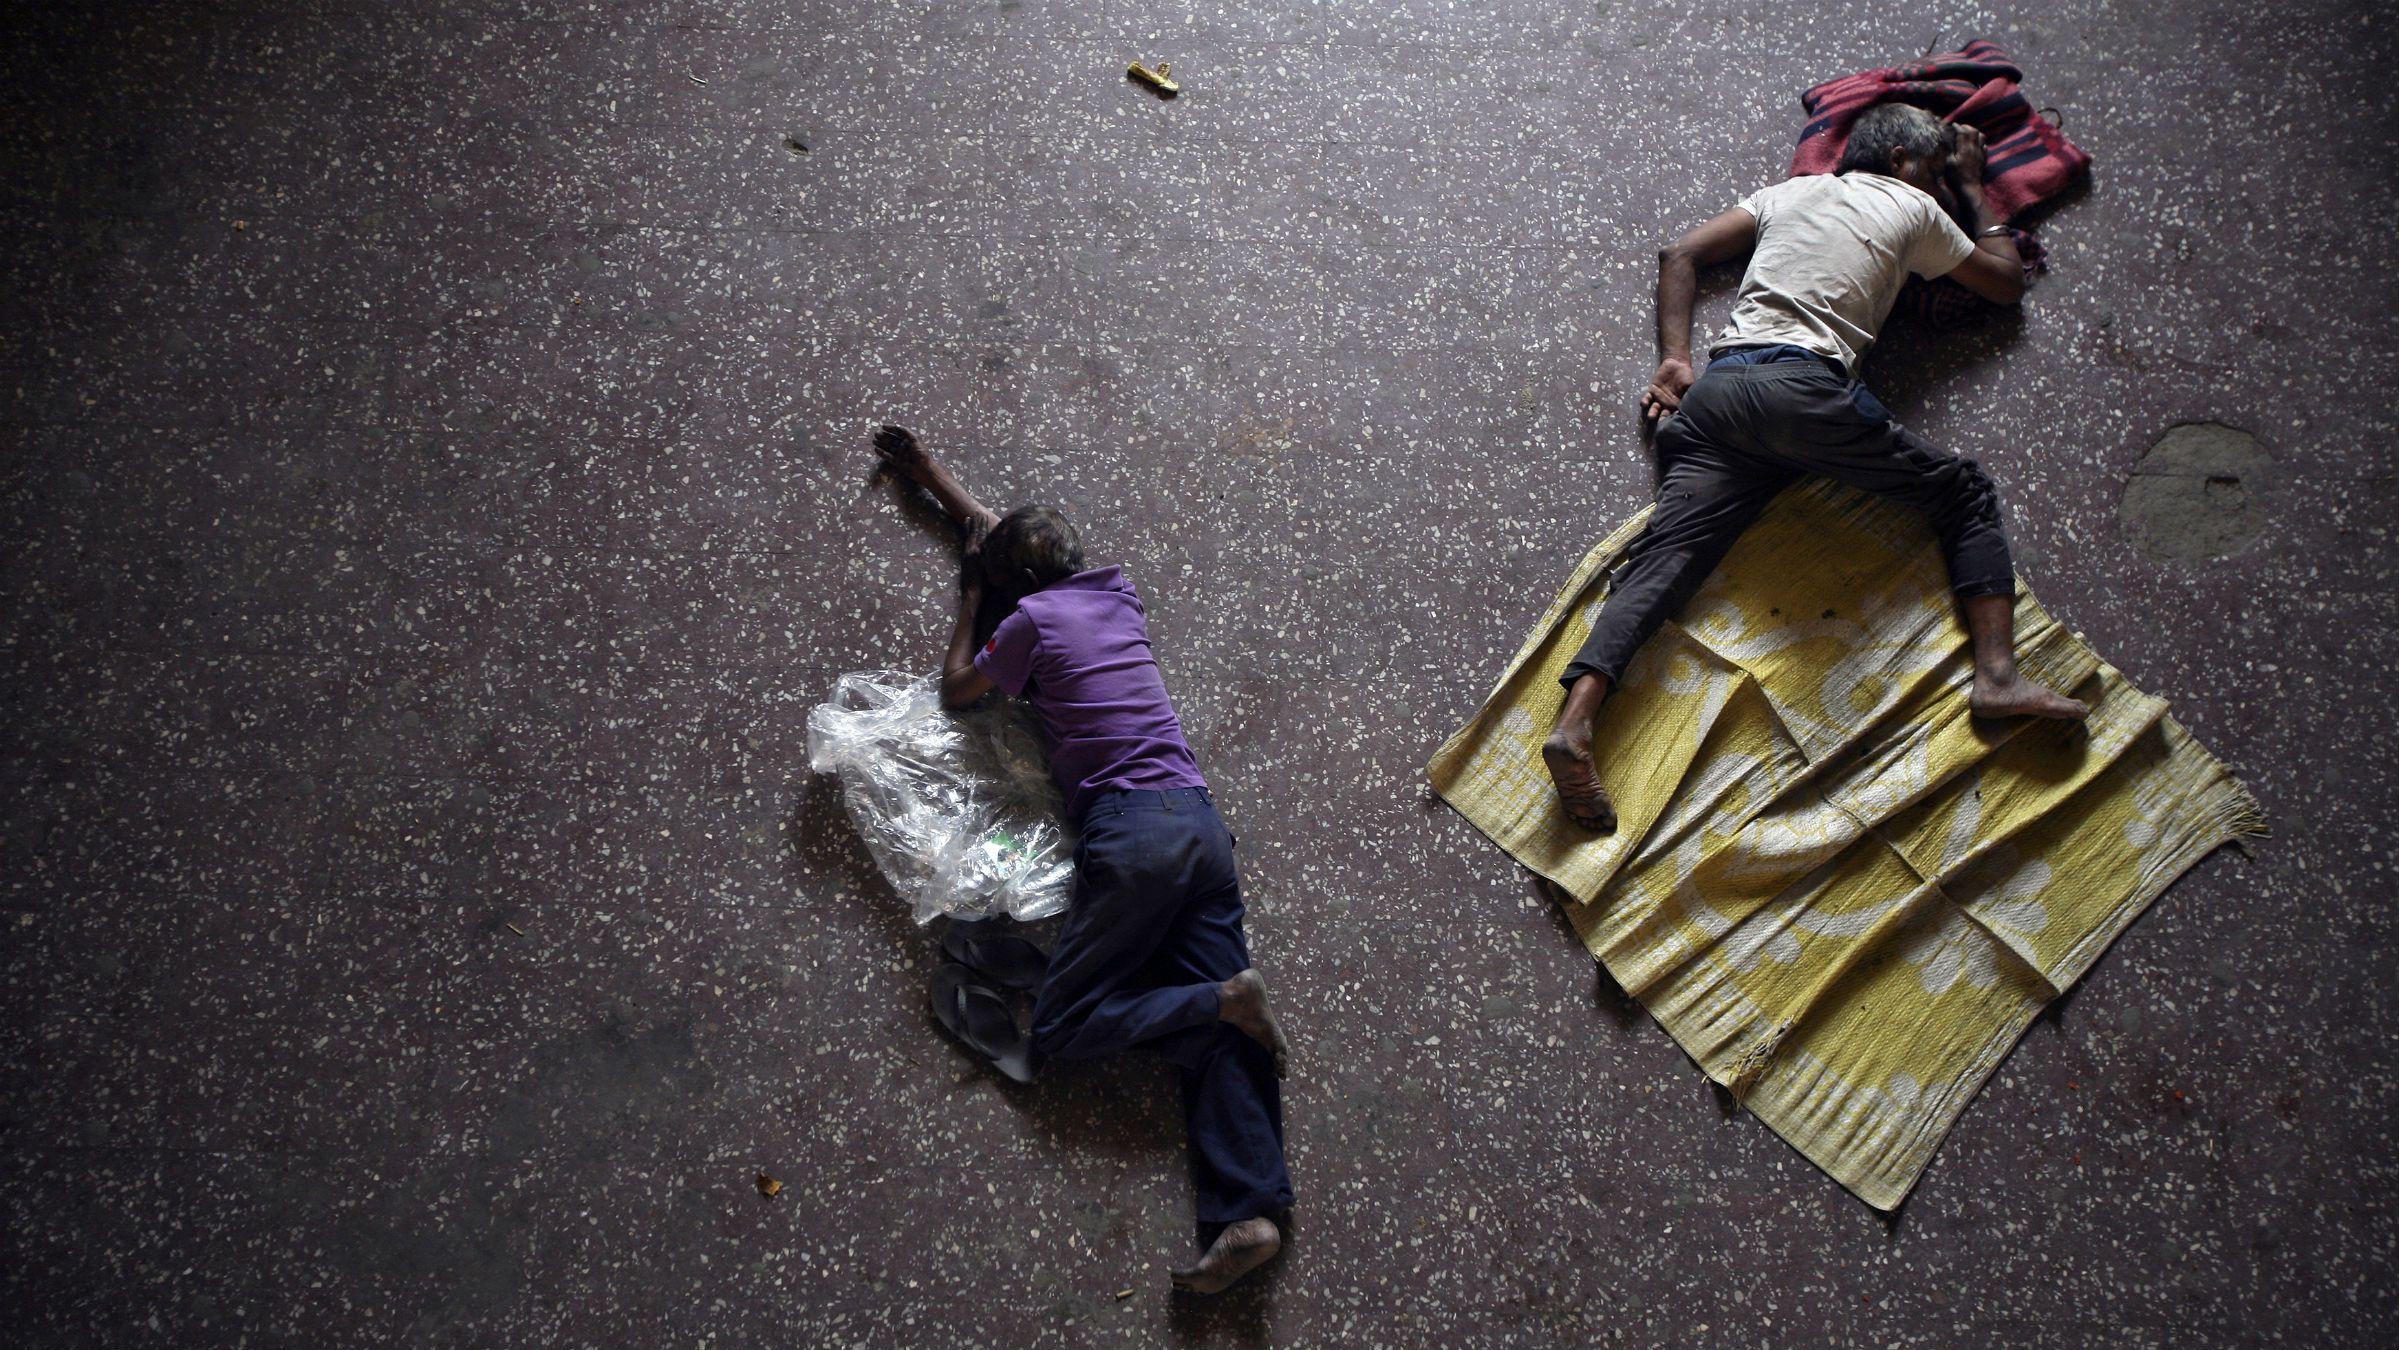 Men sleep on the bus station floor in India